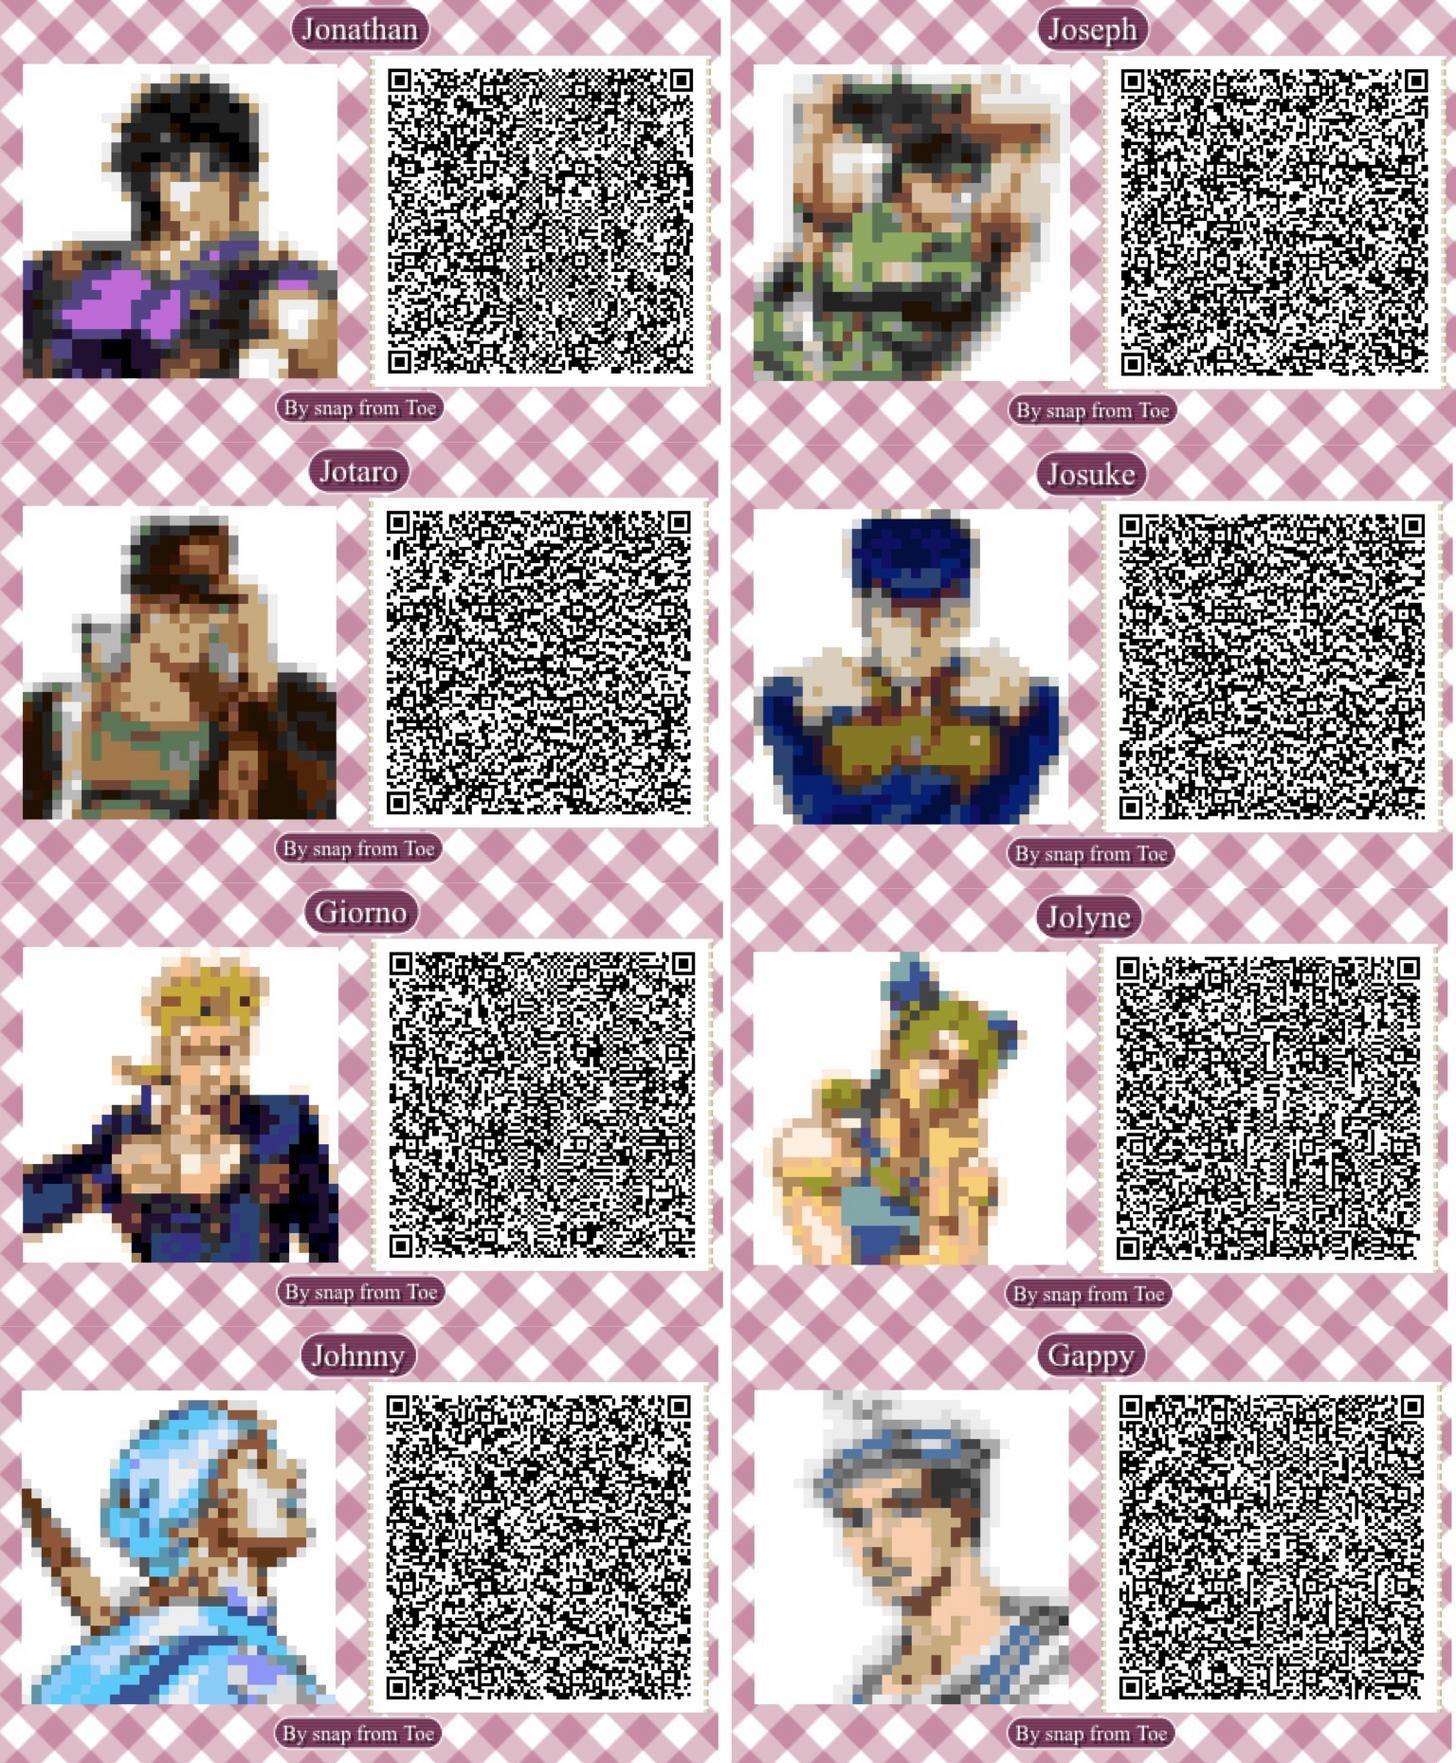 Custom Designs Animal Crossing New Horizons Vozeli Com